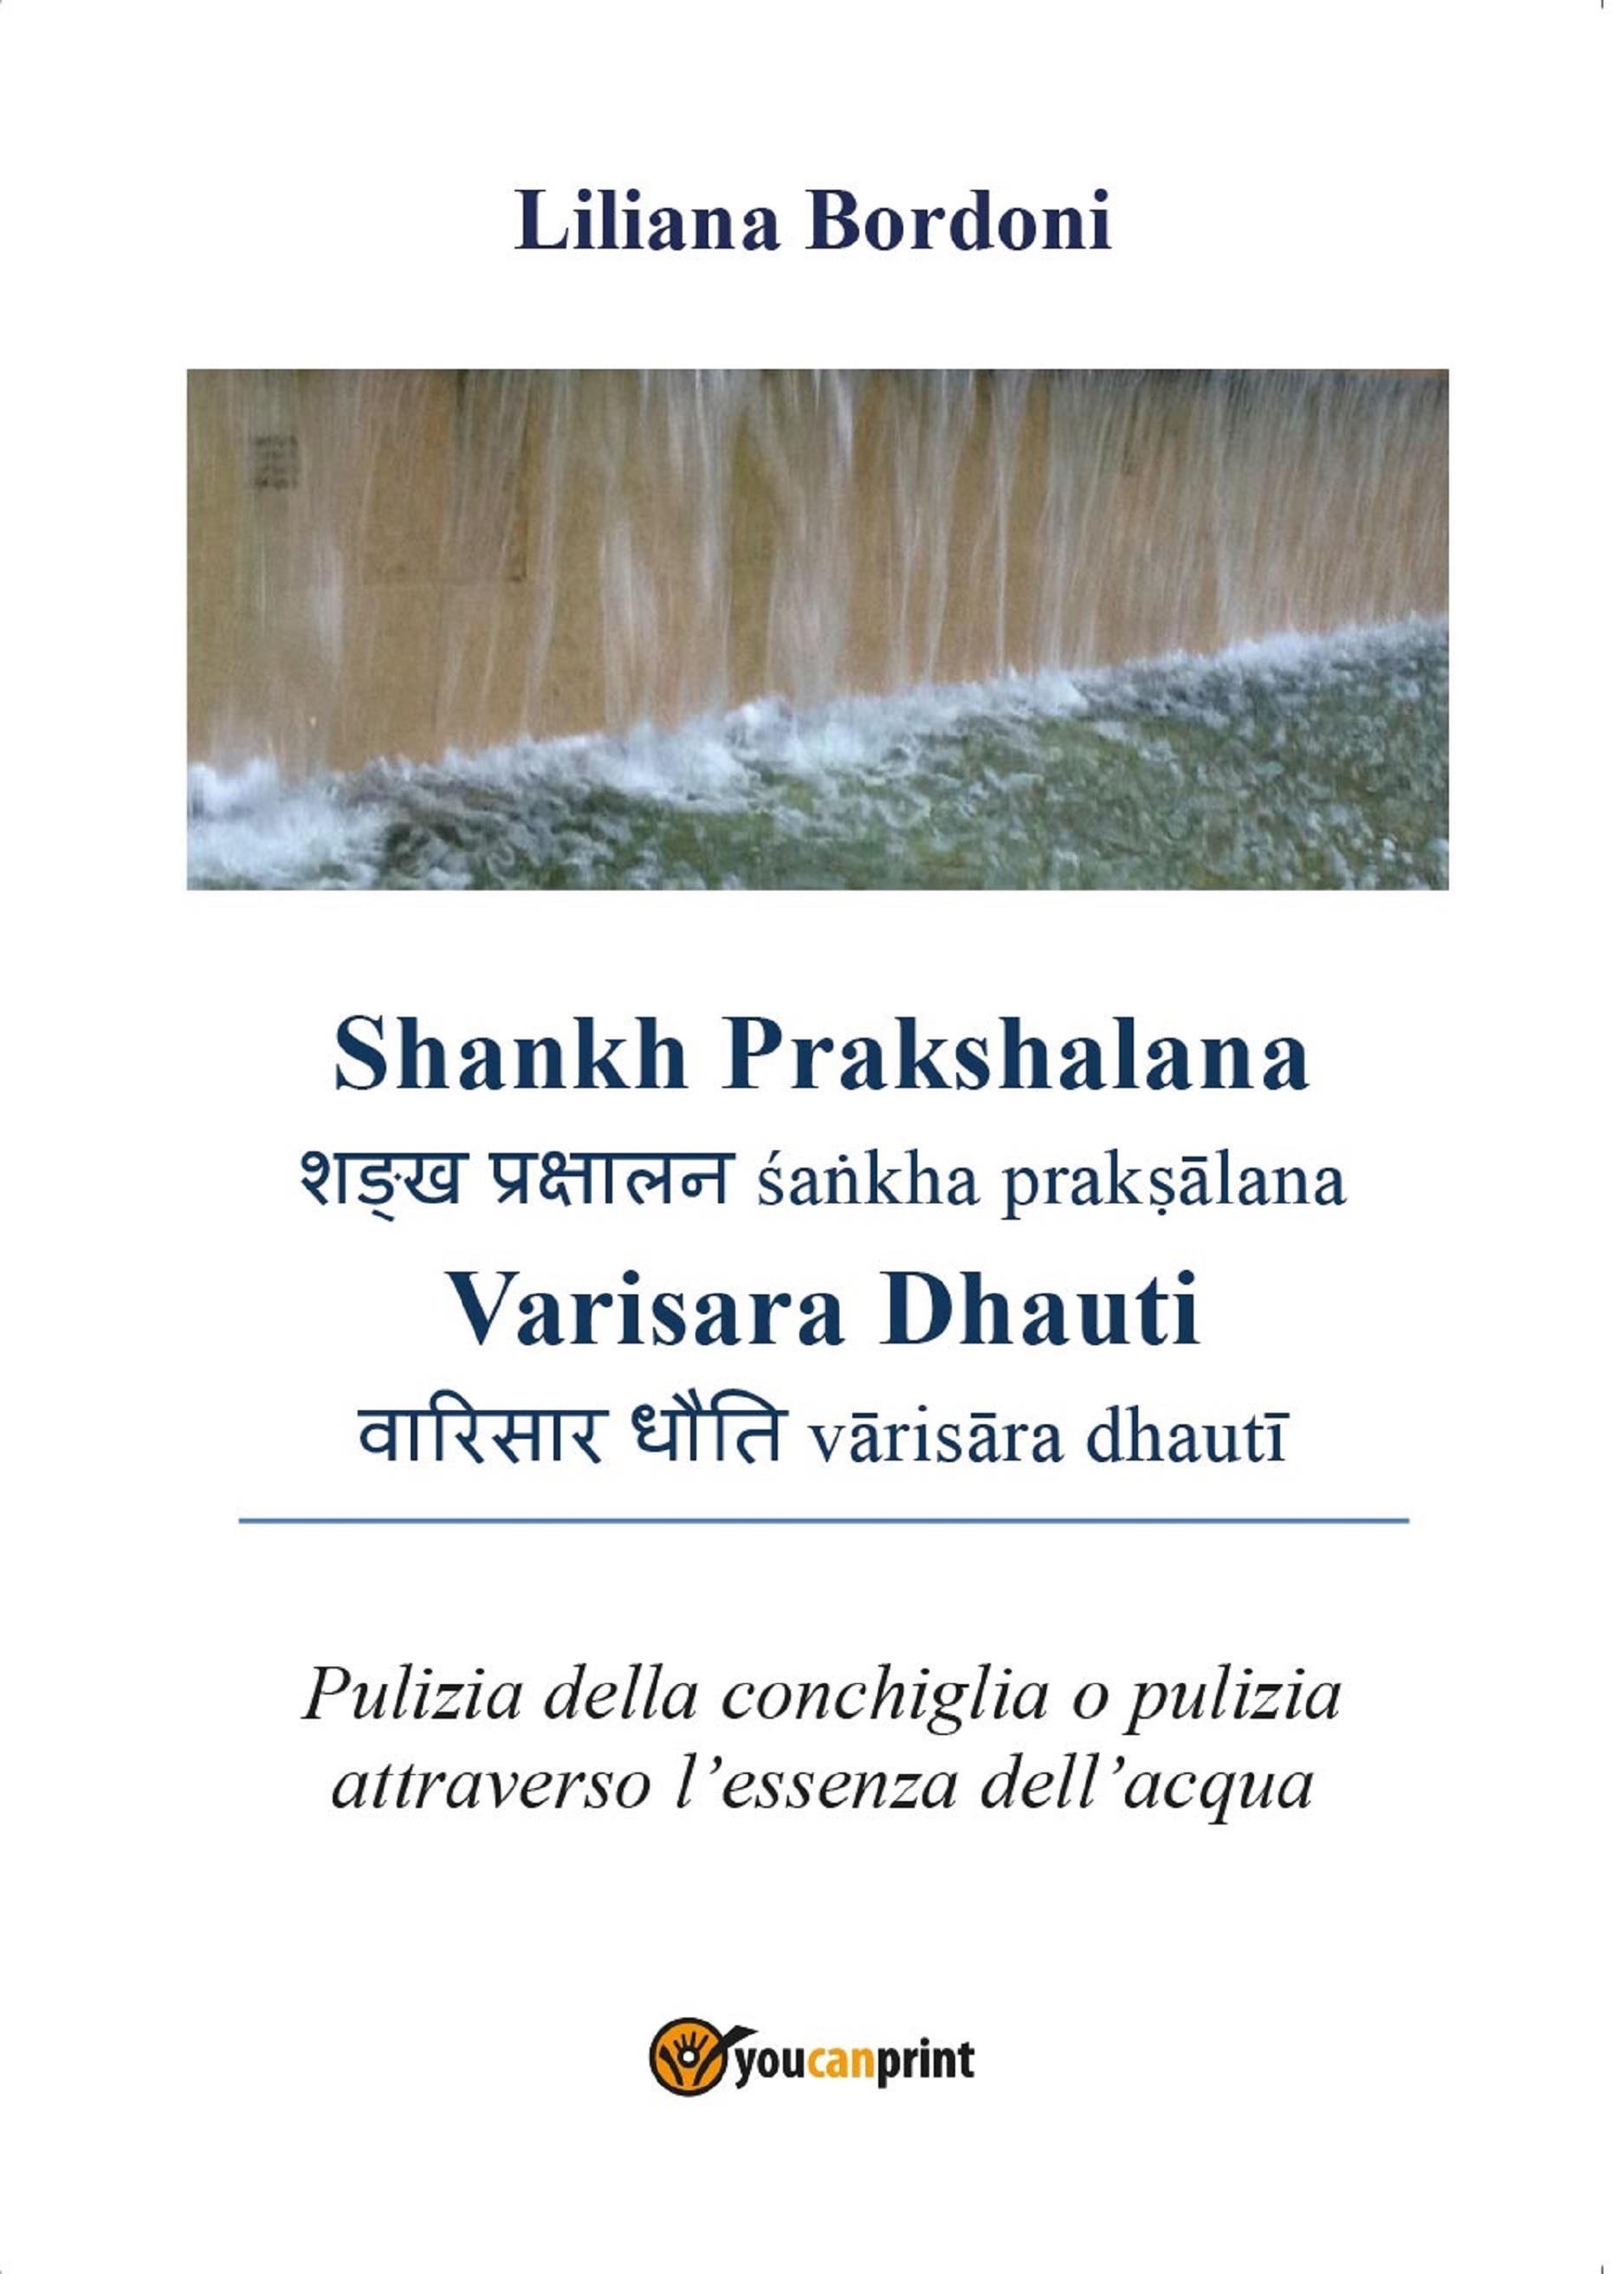 Shankh Prakshalana - Varisara Dhauti. Pulizia della conchiglia o pulizia attraverso l'essenza dell'acqua